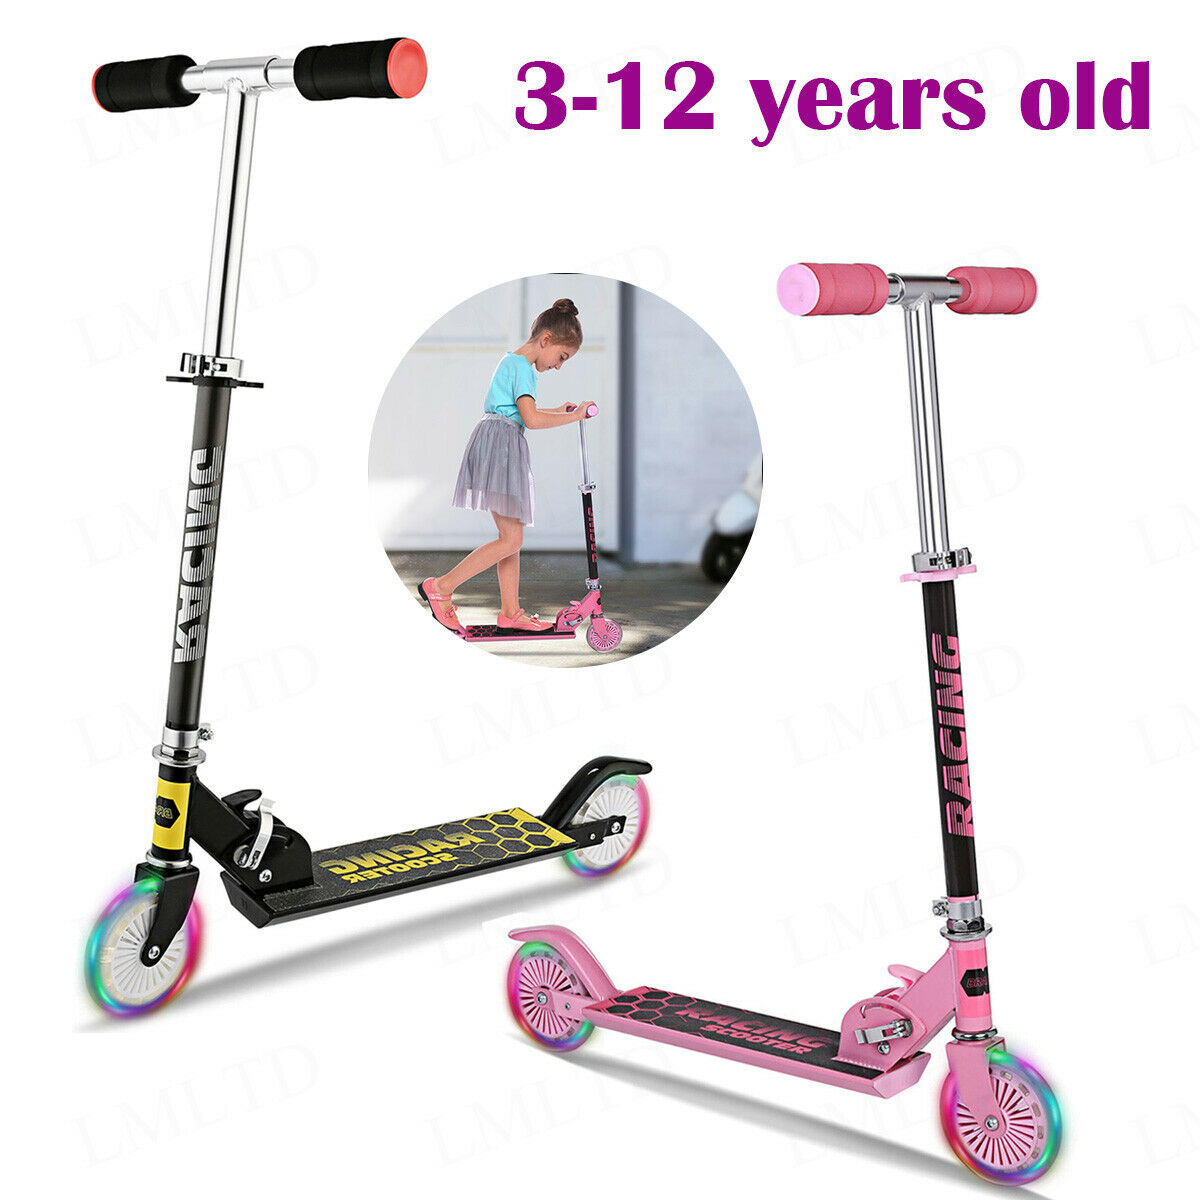 2 Wheels Kids Scooter Adjustable Height Deluxe Kick Scooters